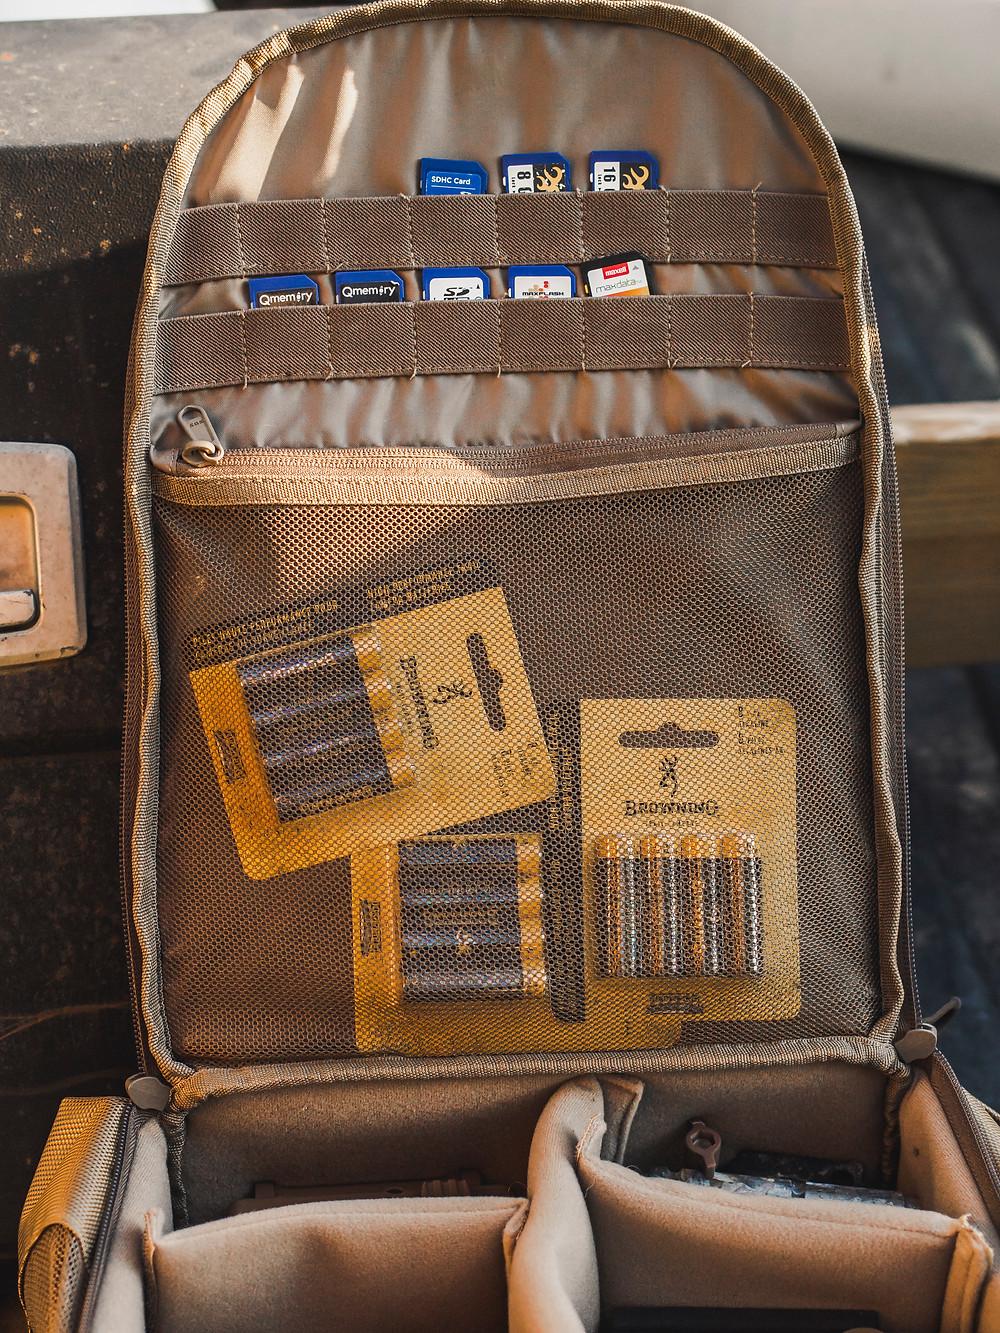 Alps OutdoorZ Motive Pack Inside